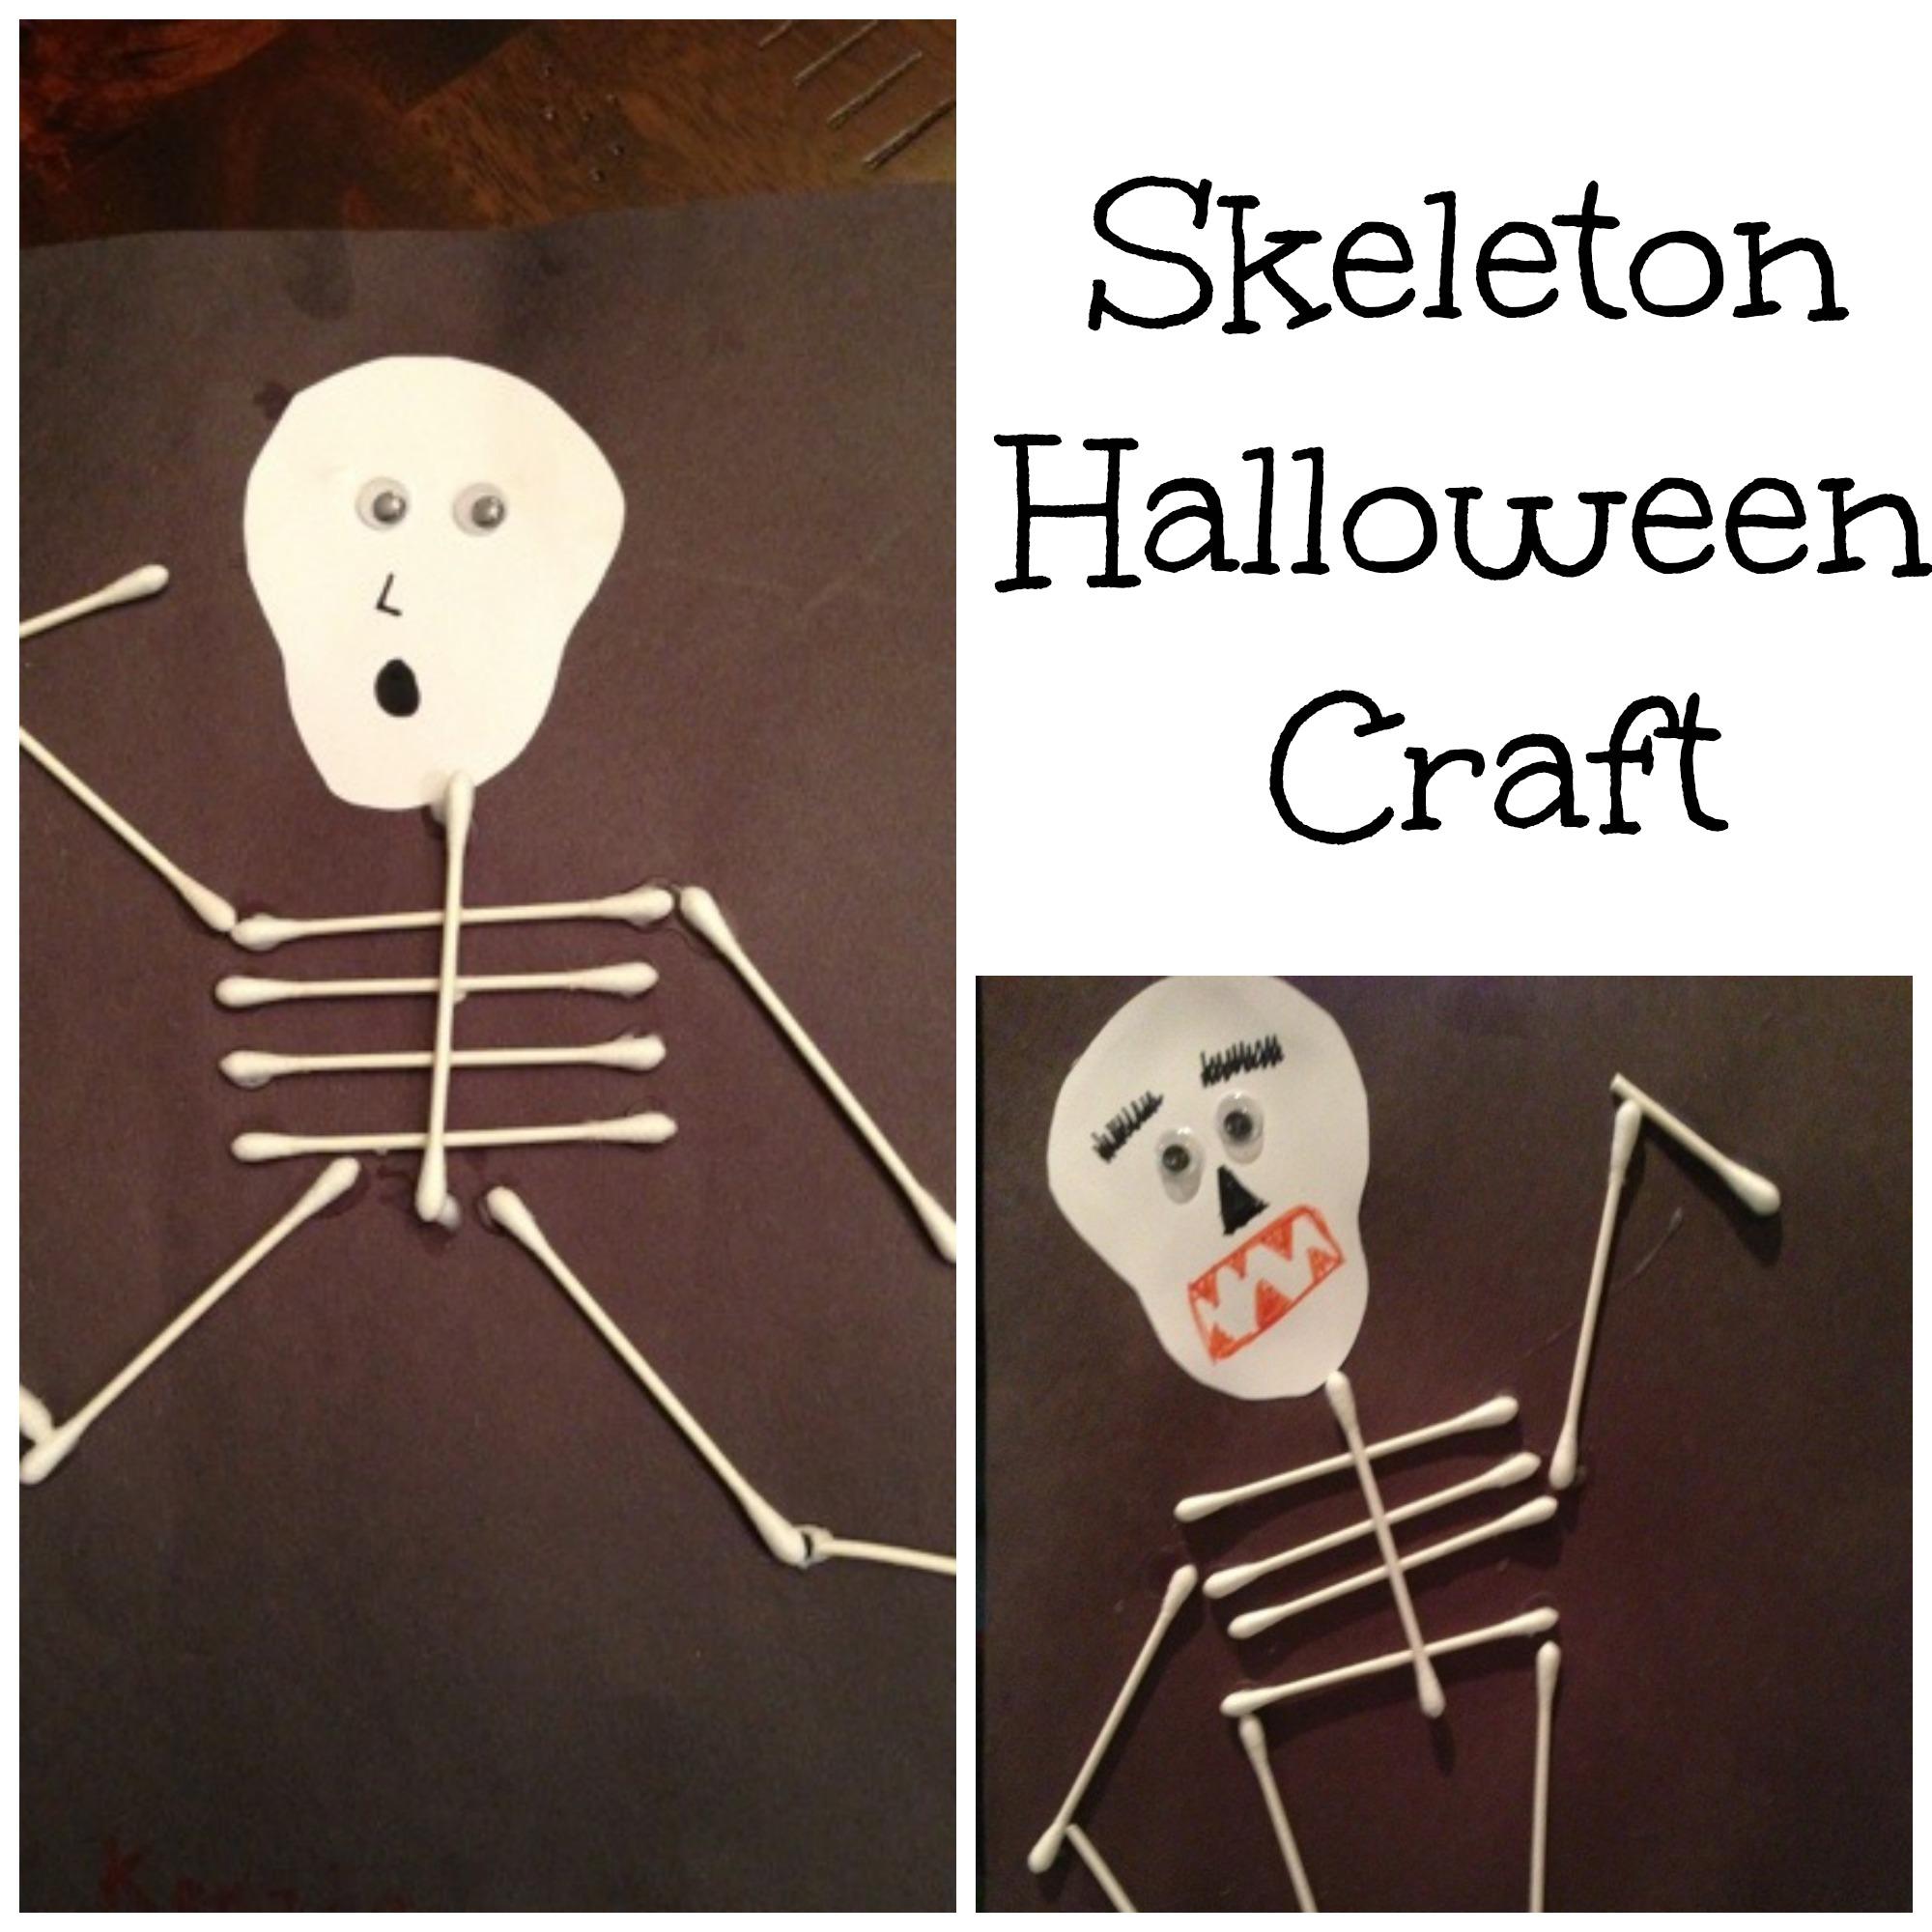 Skeleton Q-Tip Craft for Halloween - Classy Mommy